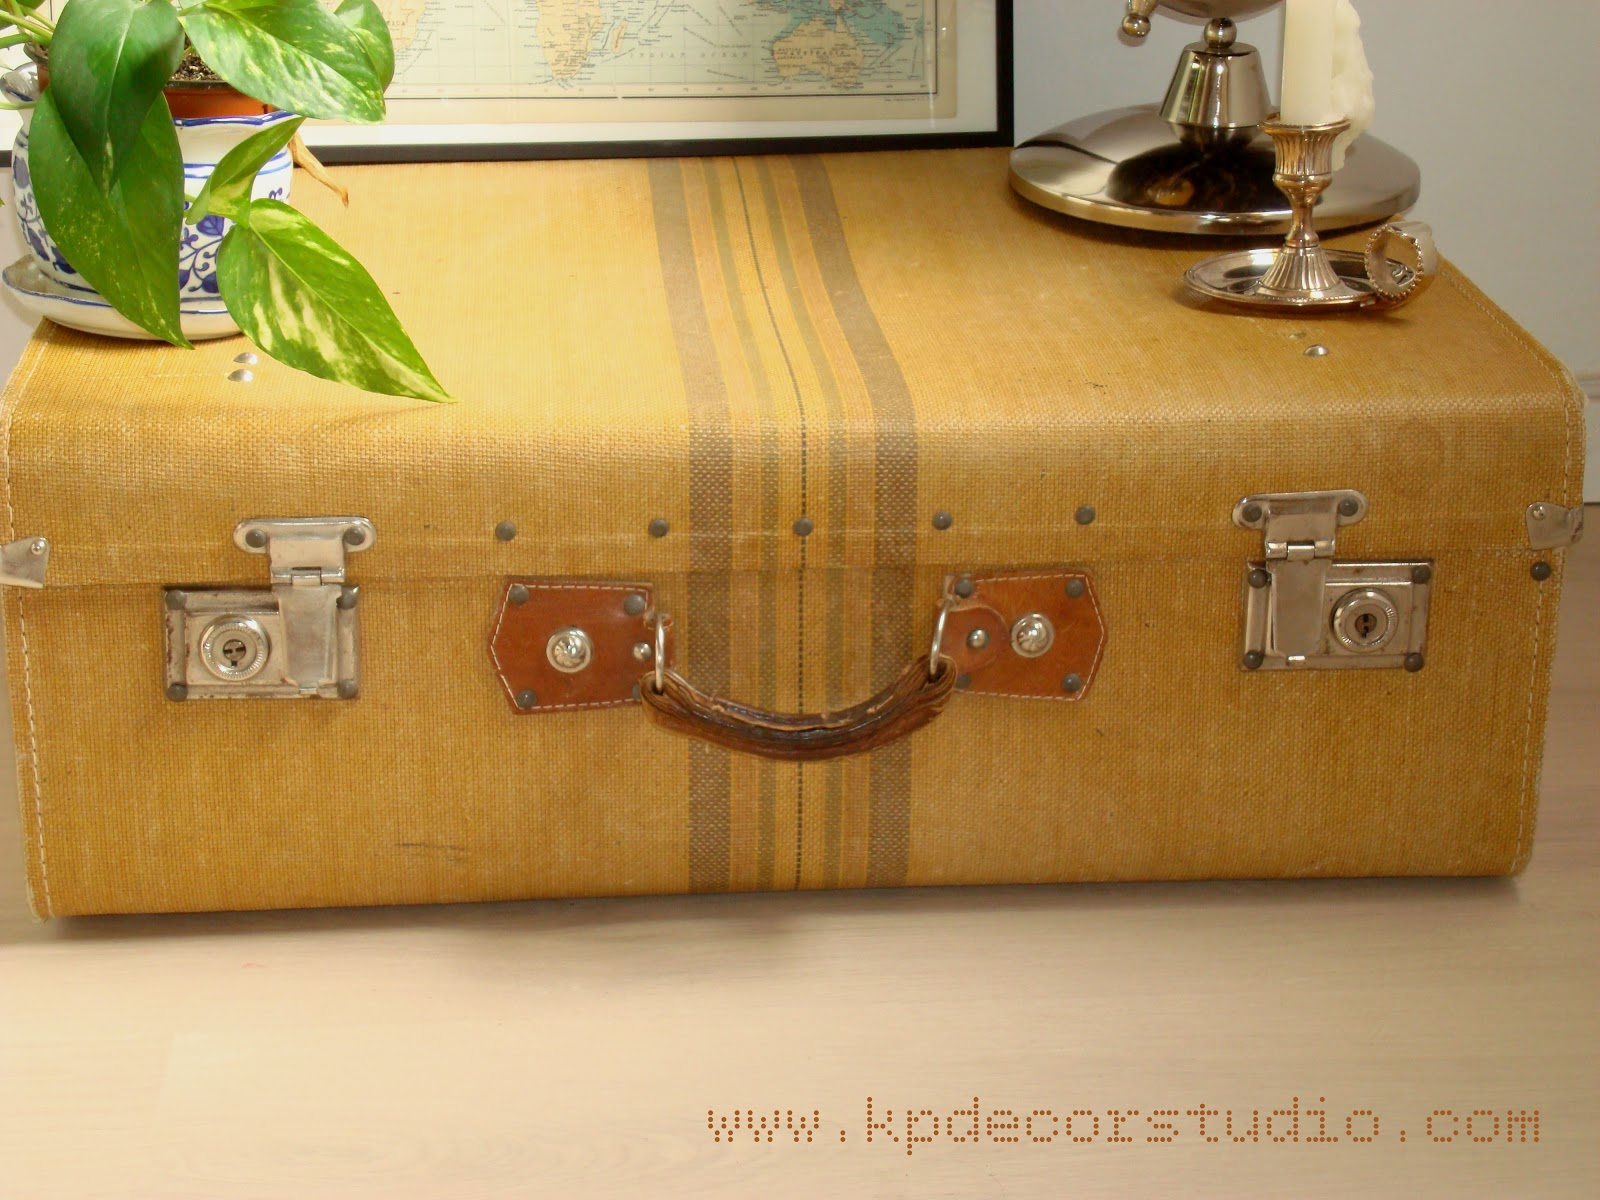 Maletas Antiguas Online Of Kp Tienda Vintage Online Maleta Antigua Vintage Suitcase